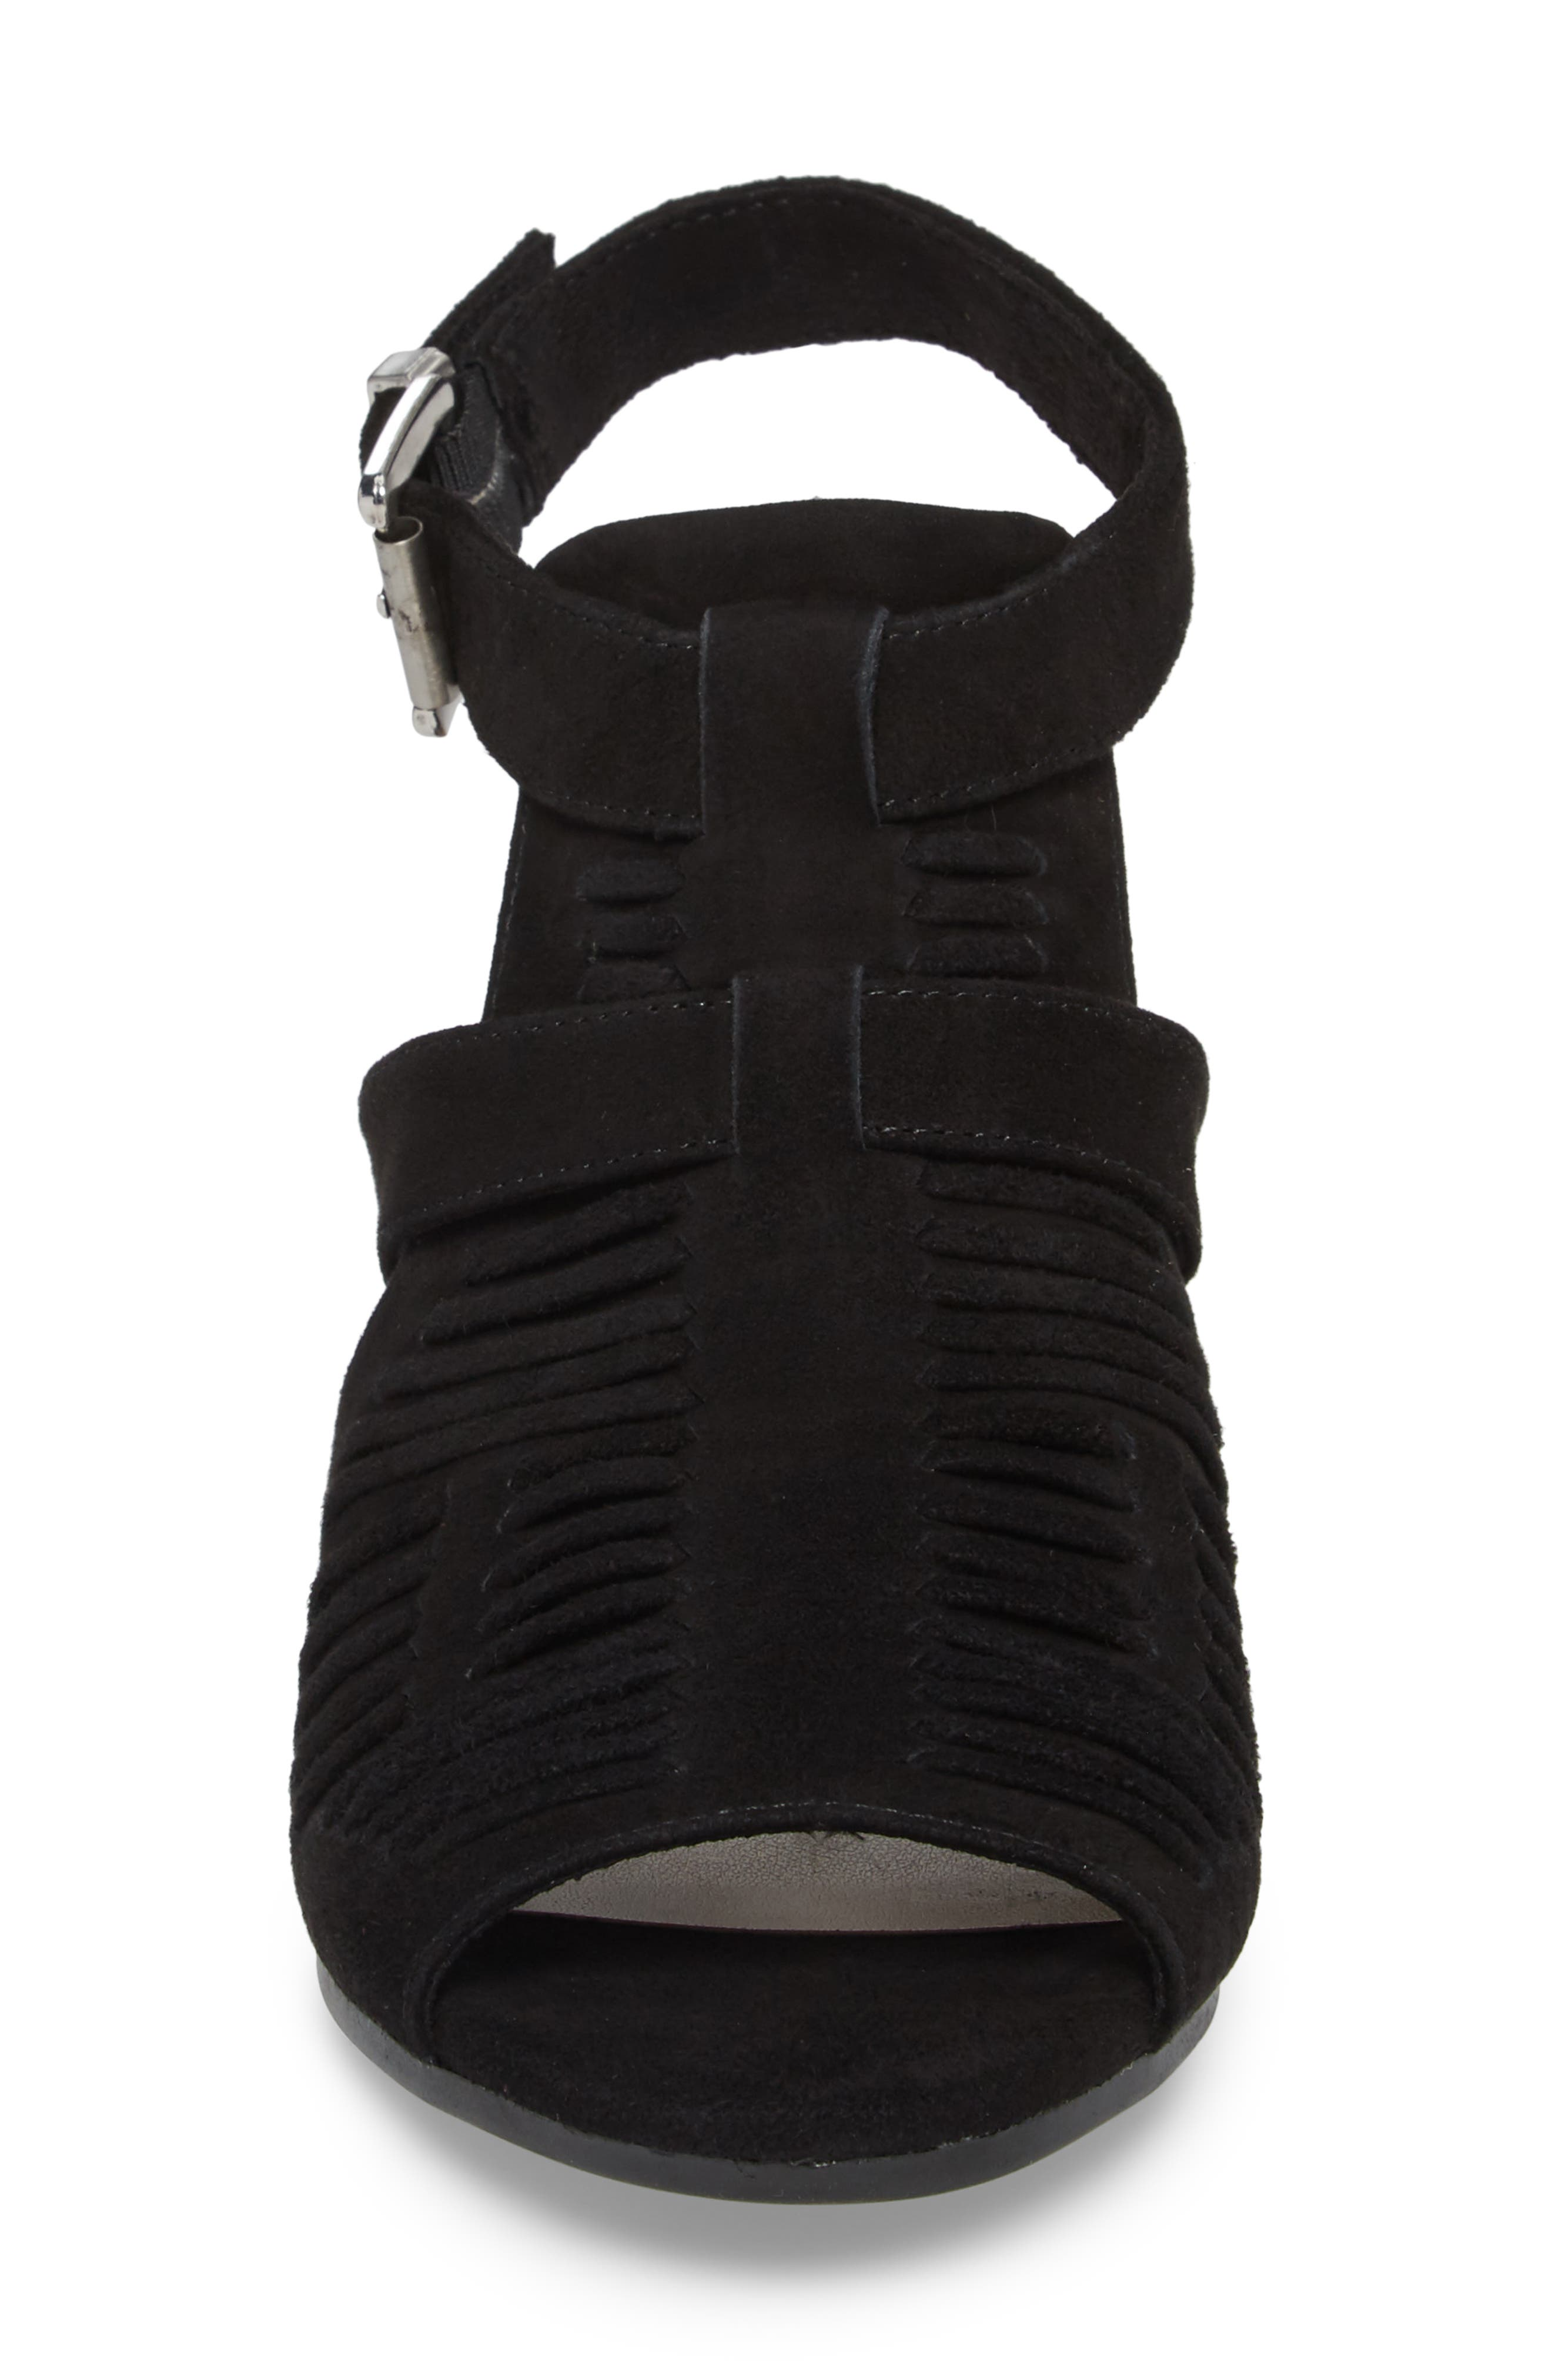 Finley Ankle Strap Sandal,                             Alternate thumbnail 4, color,                             Black Suede